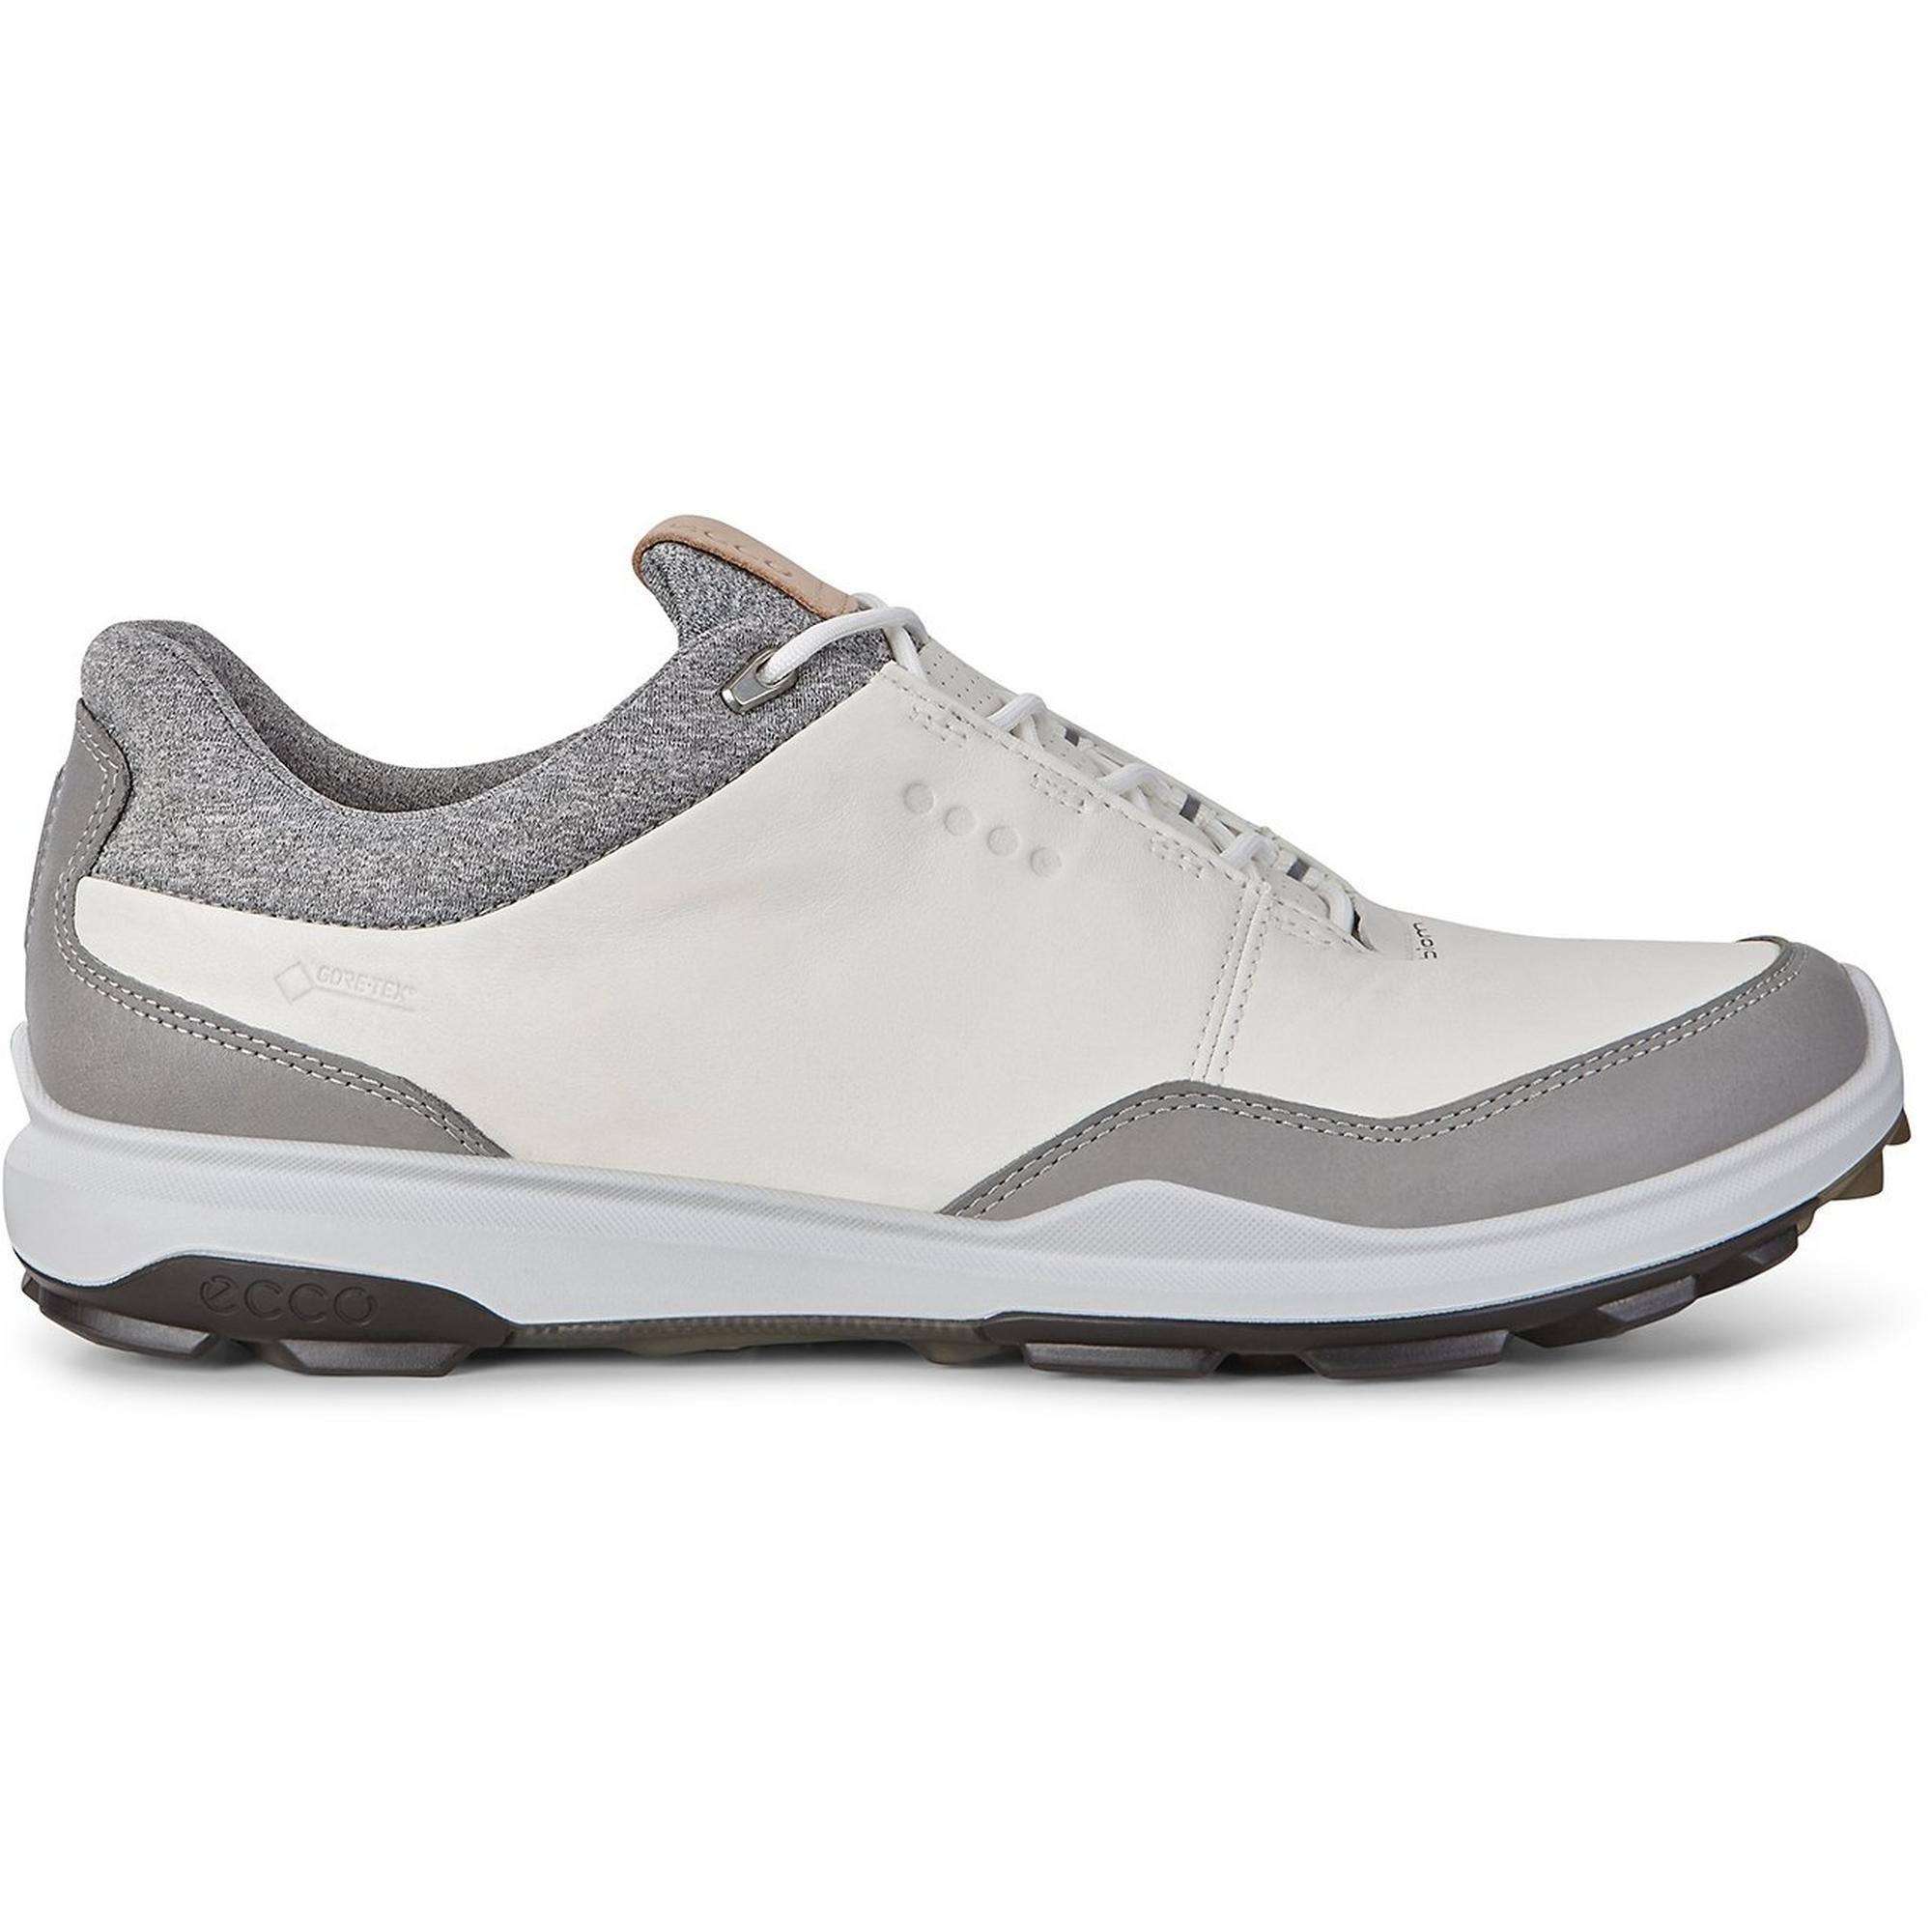 Men's Goretex Biom Hybrid 3 Spikeless Golf Shoe – WHT/BLK